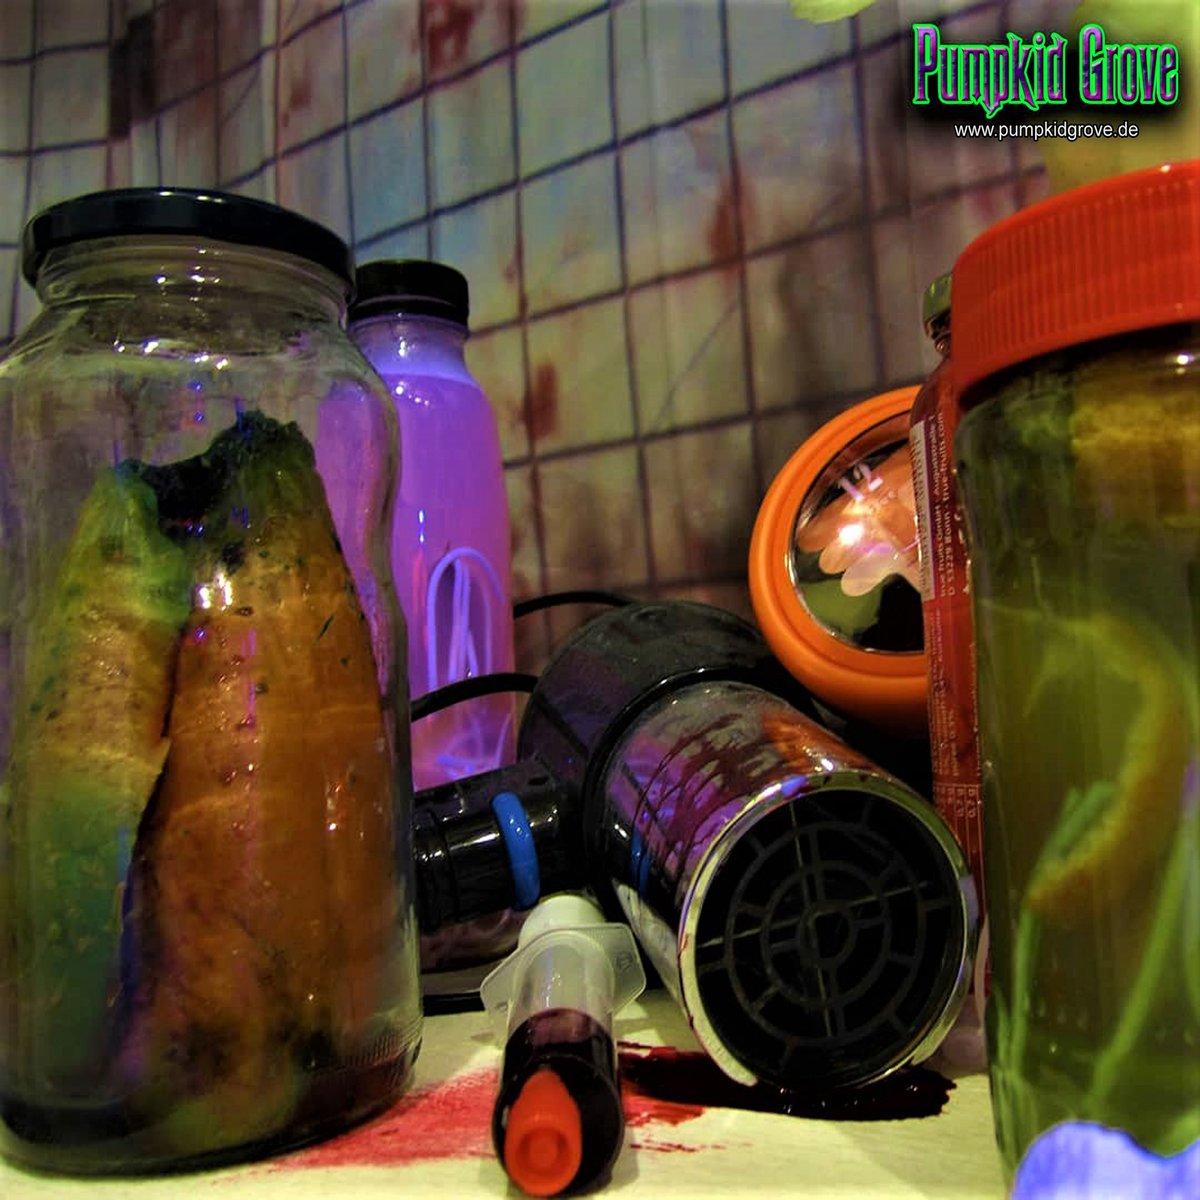 Alien-Vagina 😄 #halloween2015 #halloween #samhain #ahsfx #luegburghorrorstory #alien #vagina #labor #laboratory #glas #kürbis #pumpkin #blut #blood #gruselig #horror #trickortreat #party #fun #art #haunted #homehaunt #dekoration #photo #germany #pumpkidgrove #pumpkidgrovegermany https://t.co/6luMM0tRa1